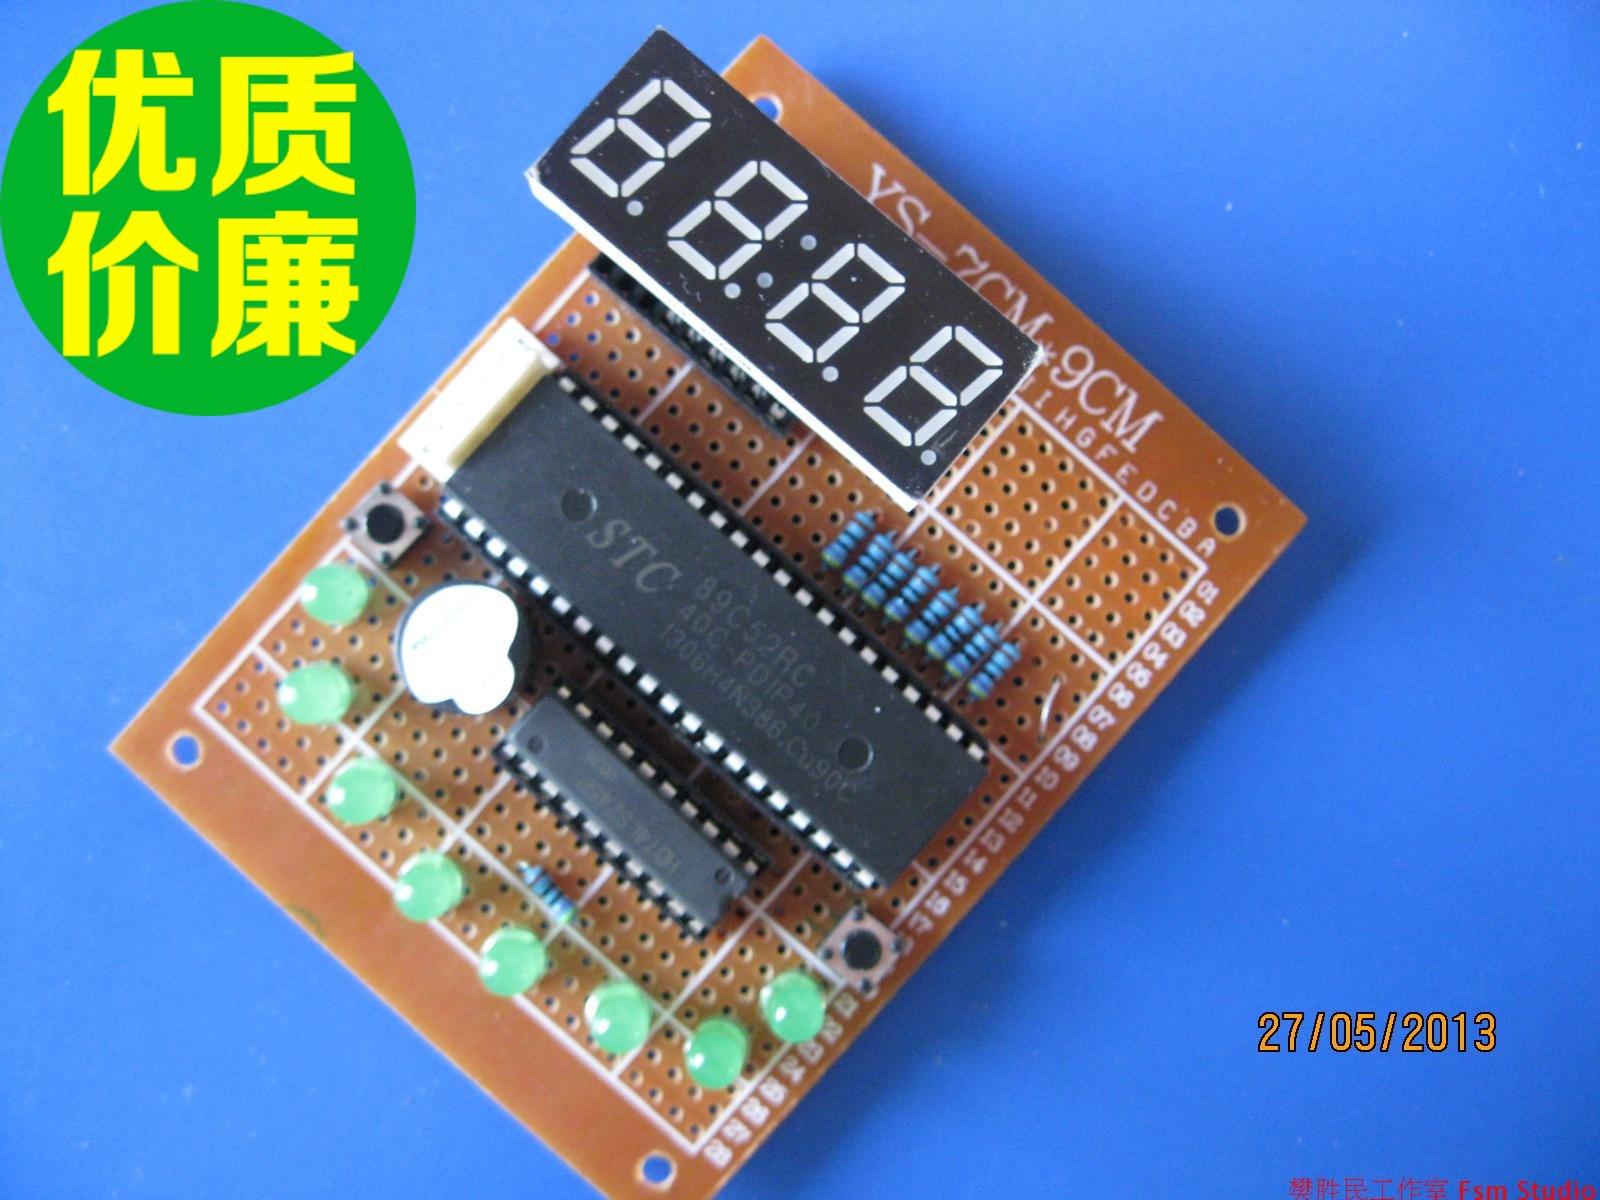 51 mcu - pendulum clock kit 3c digital accessories mcu led(China (Mainland))